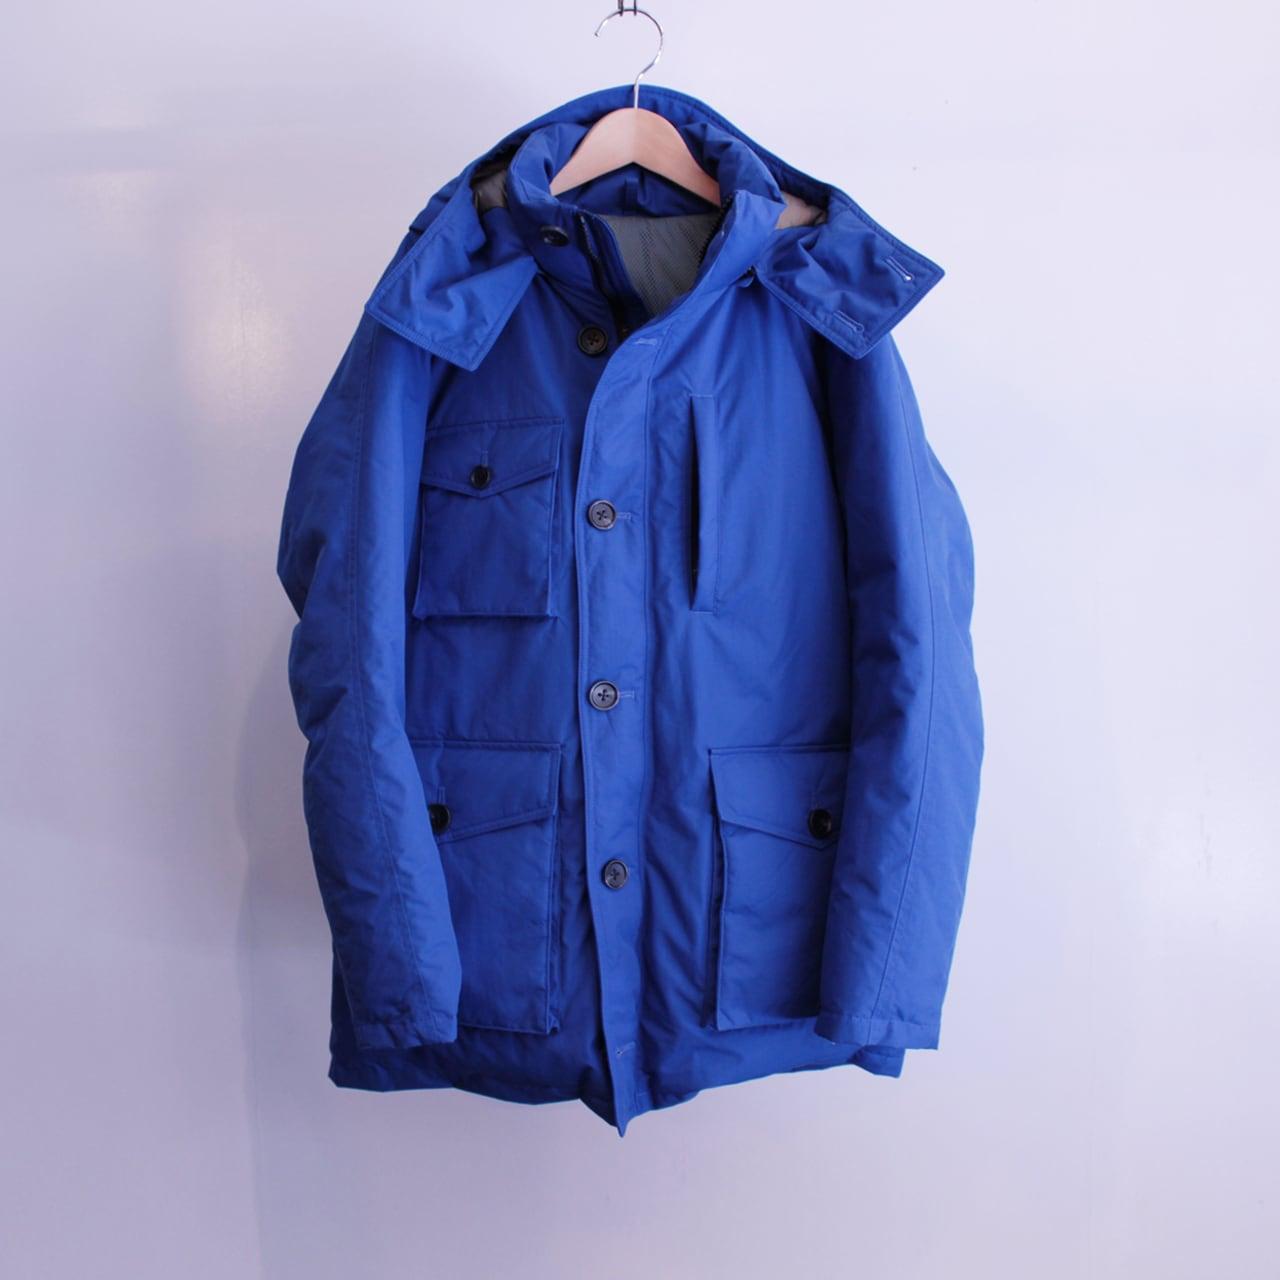 ZANTER WP 6705 BLUE